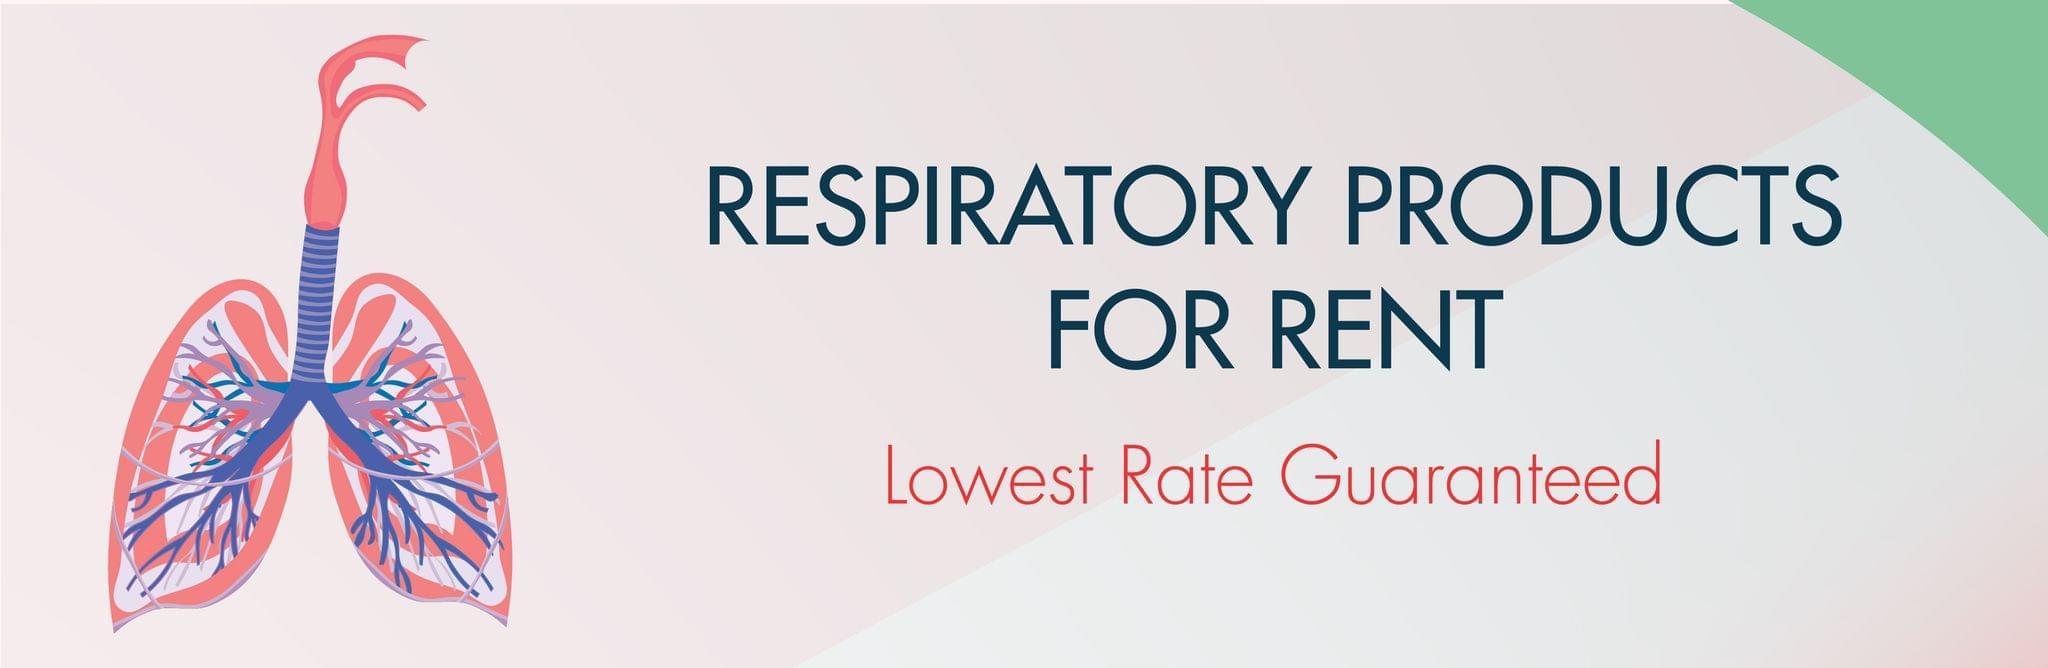 Medical Respiratory Equipment on Rent